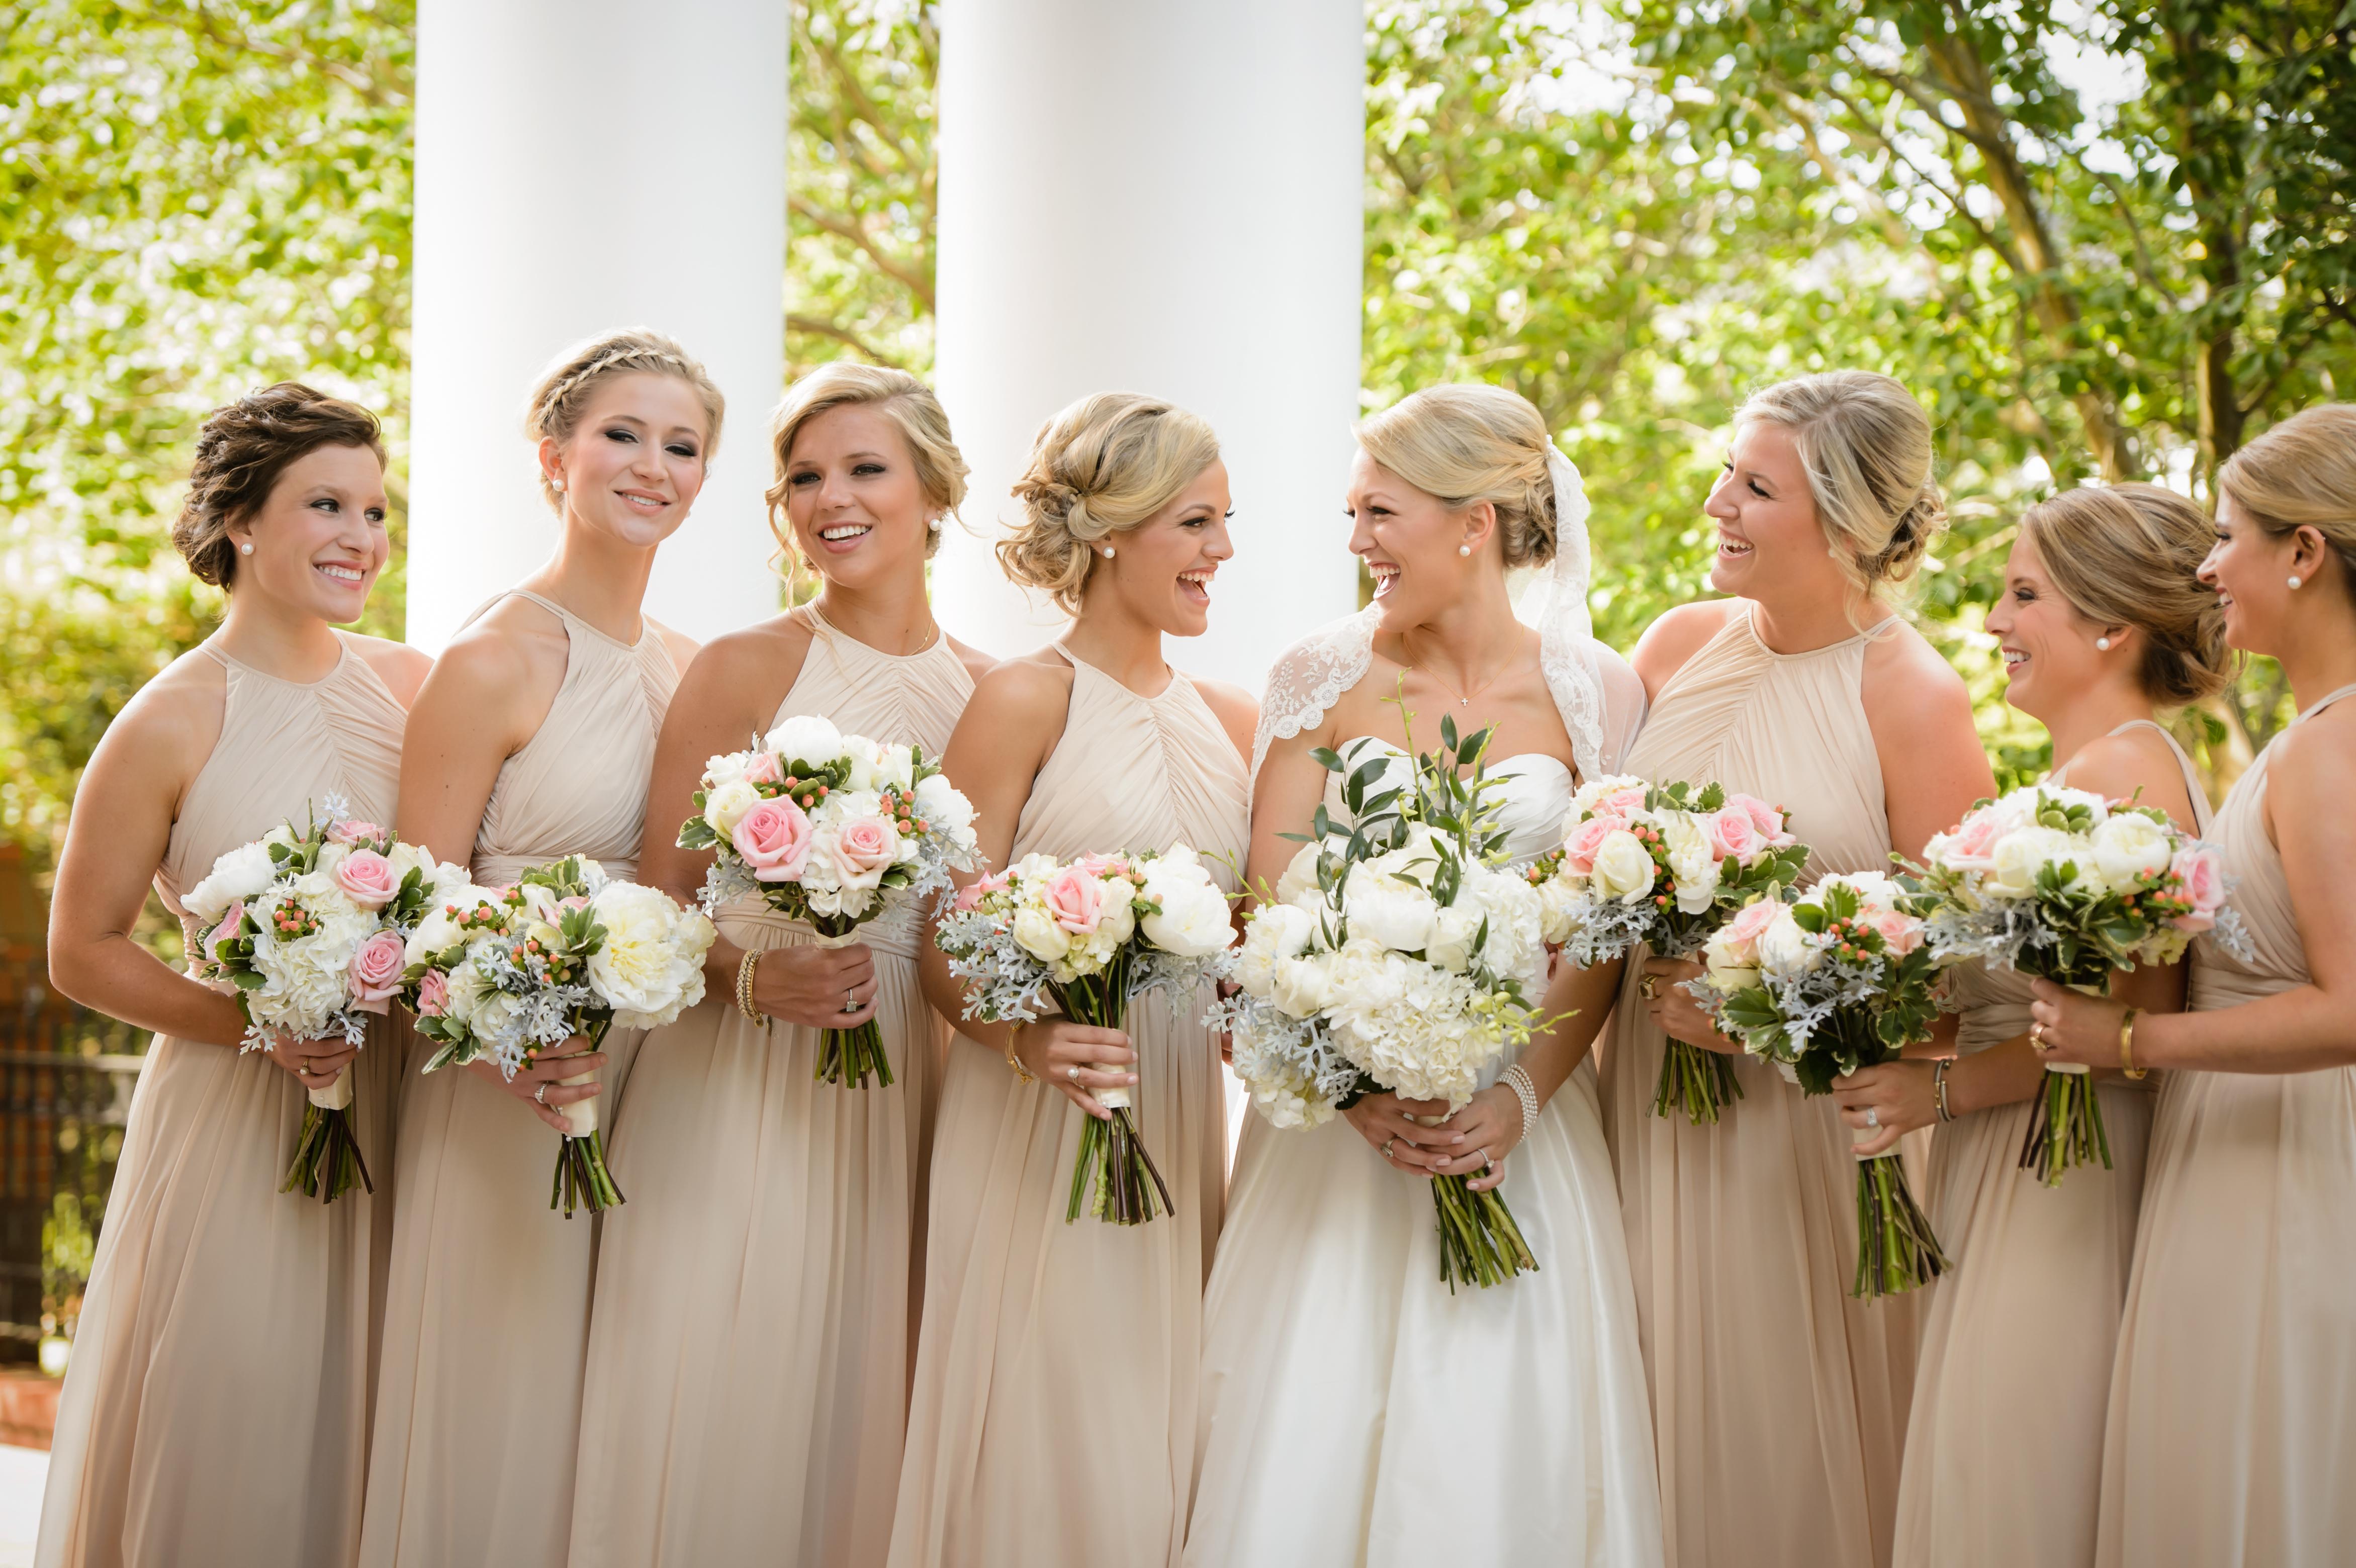 Be our guest wedding etiquette 101 bella bridesmaids dessy lux chiffon palomino ombrellifo Choice Image